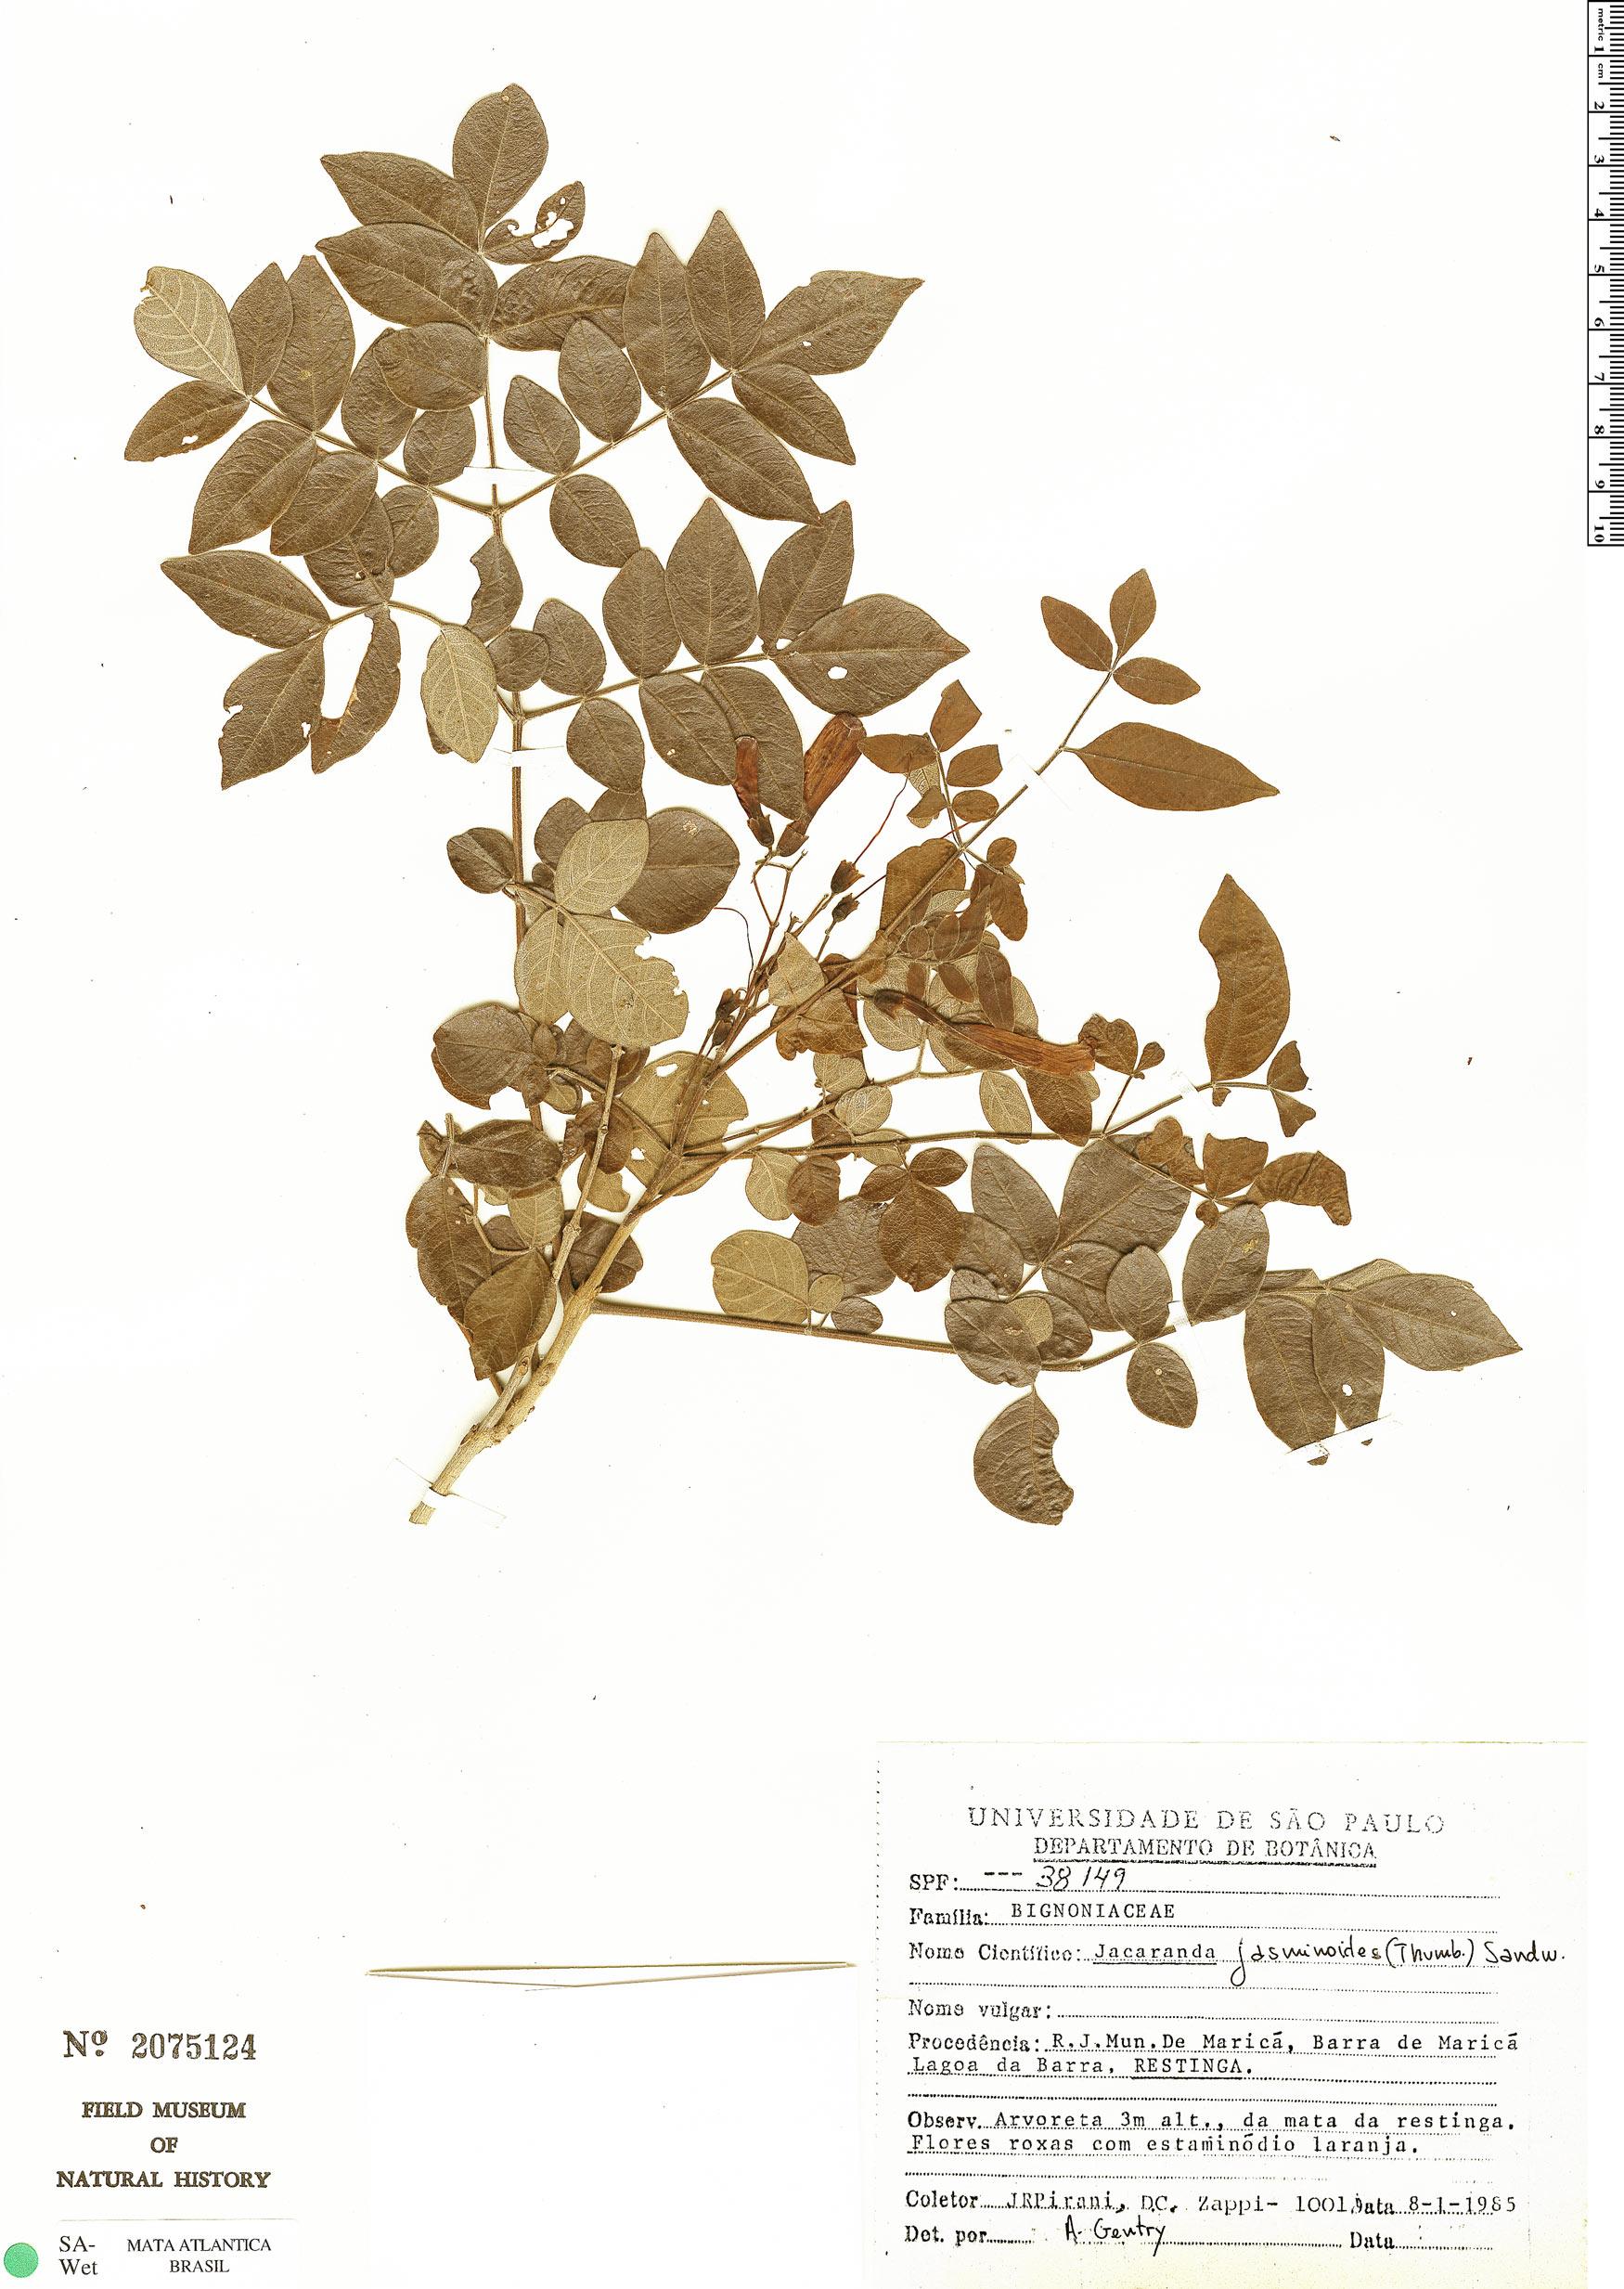 Espécime: Jacaranda jasminoides